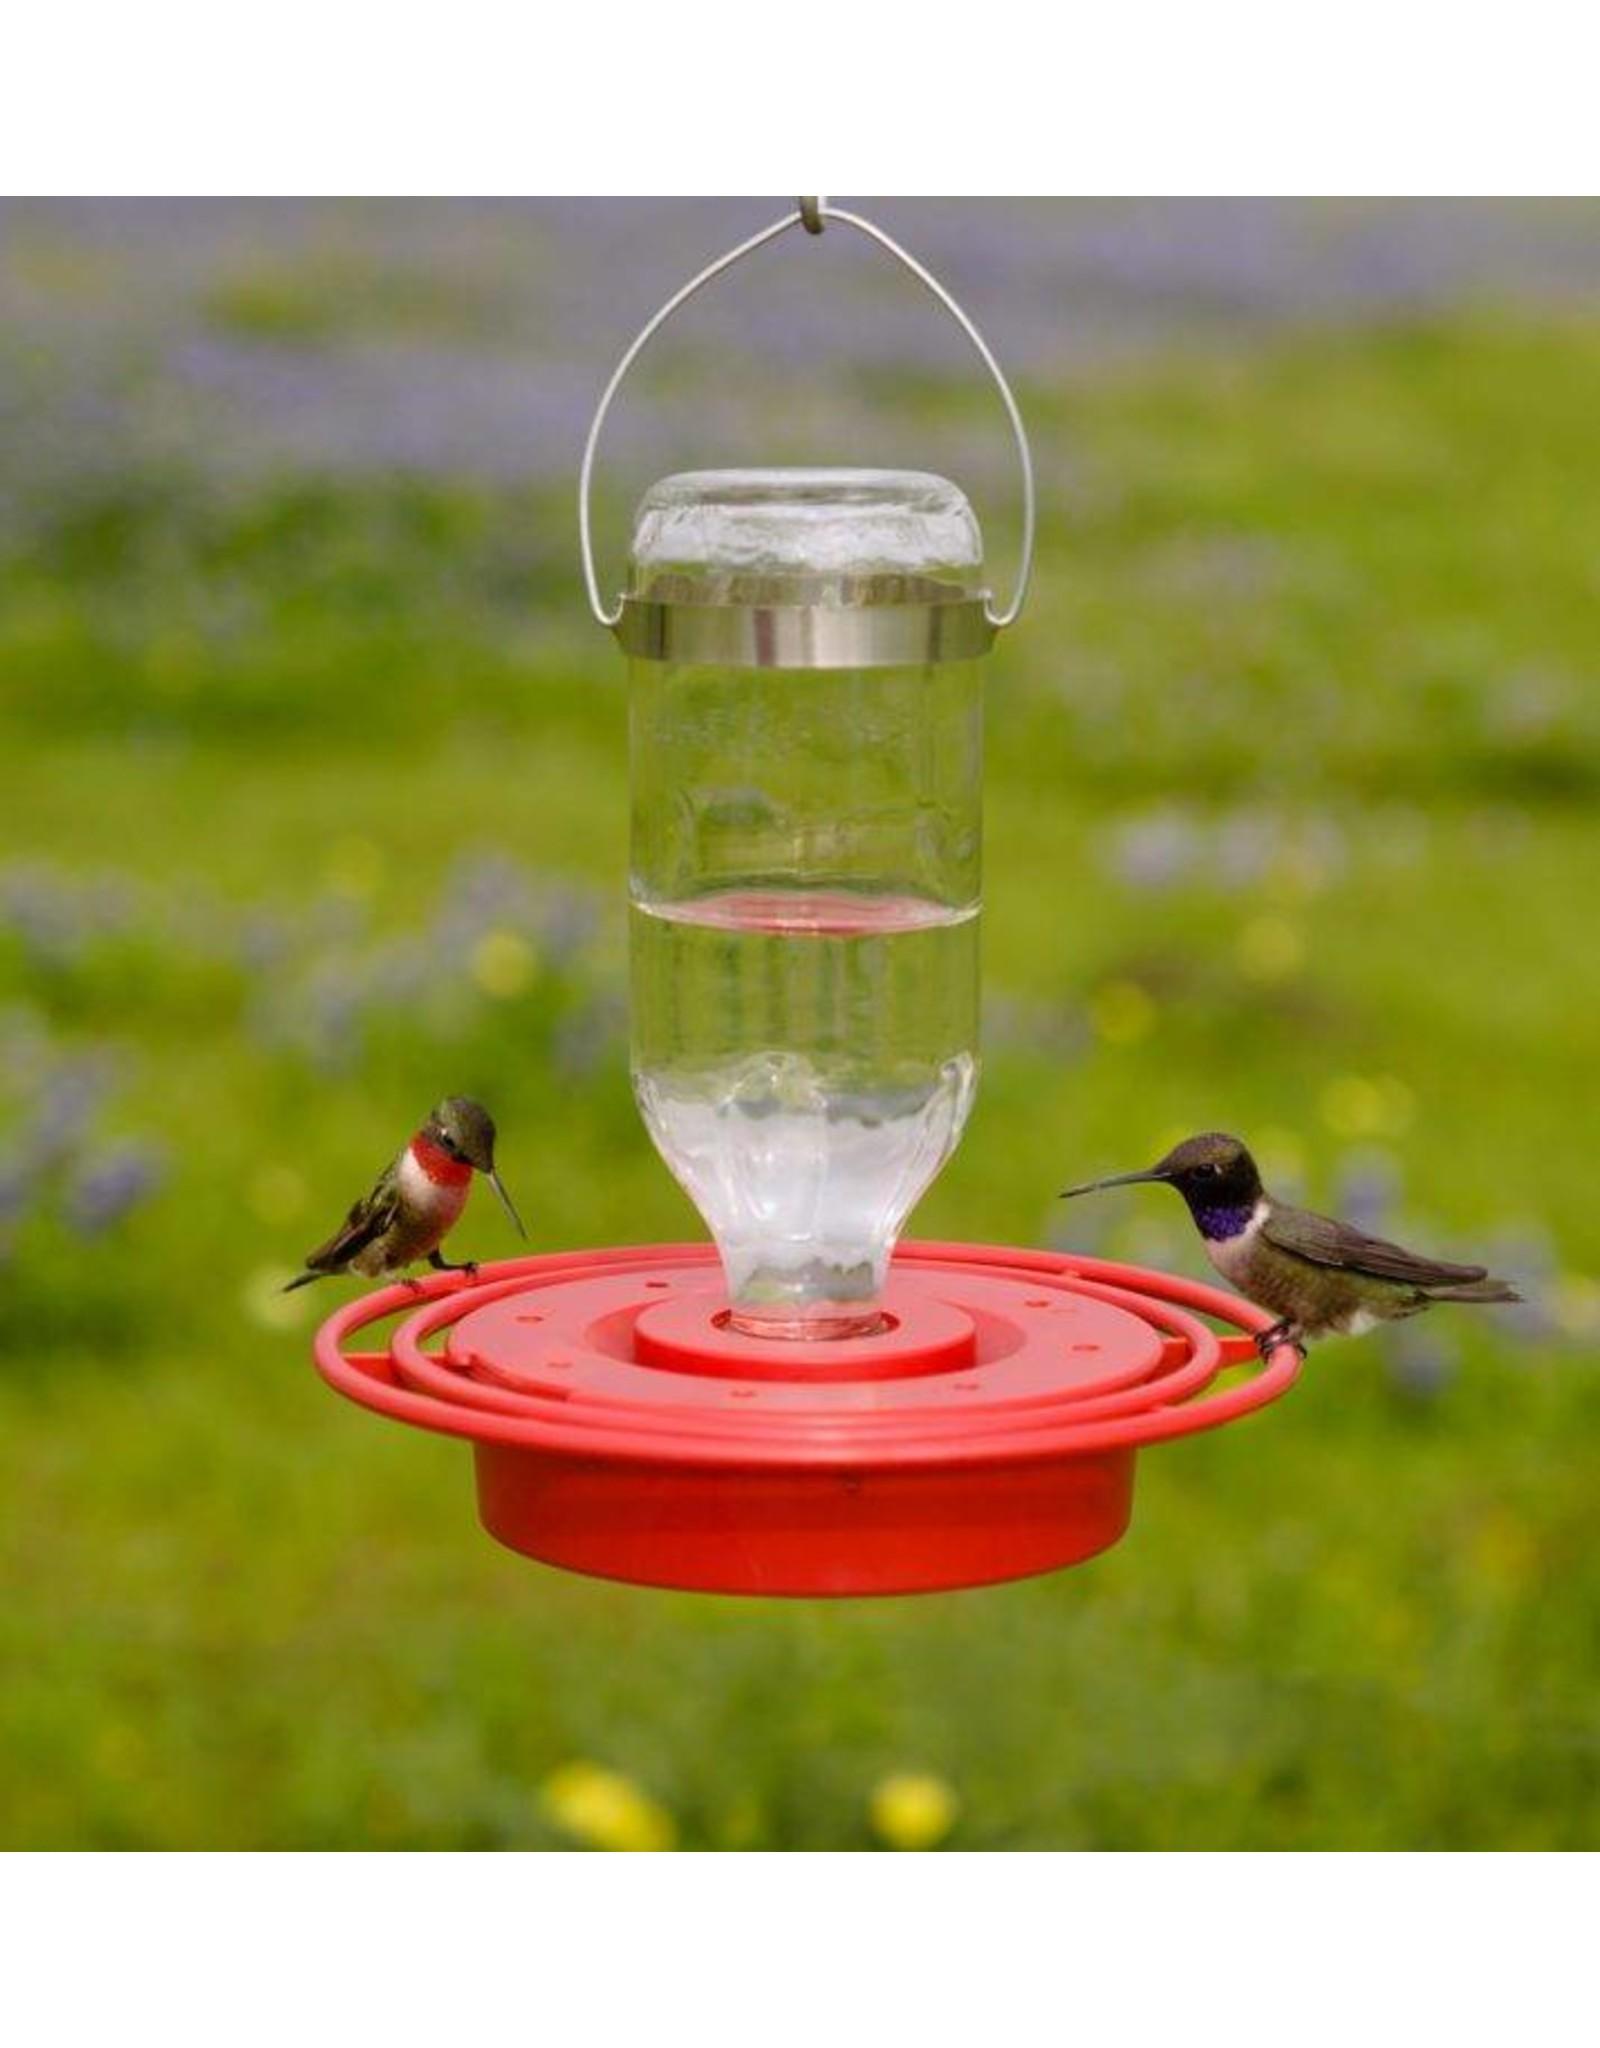 Hummingbird feeder, 8oz., Glass Bottle, BEST8